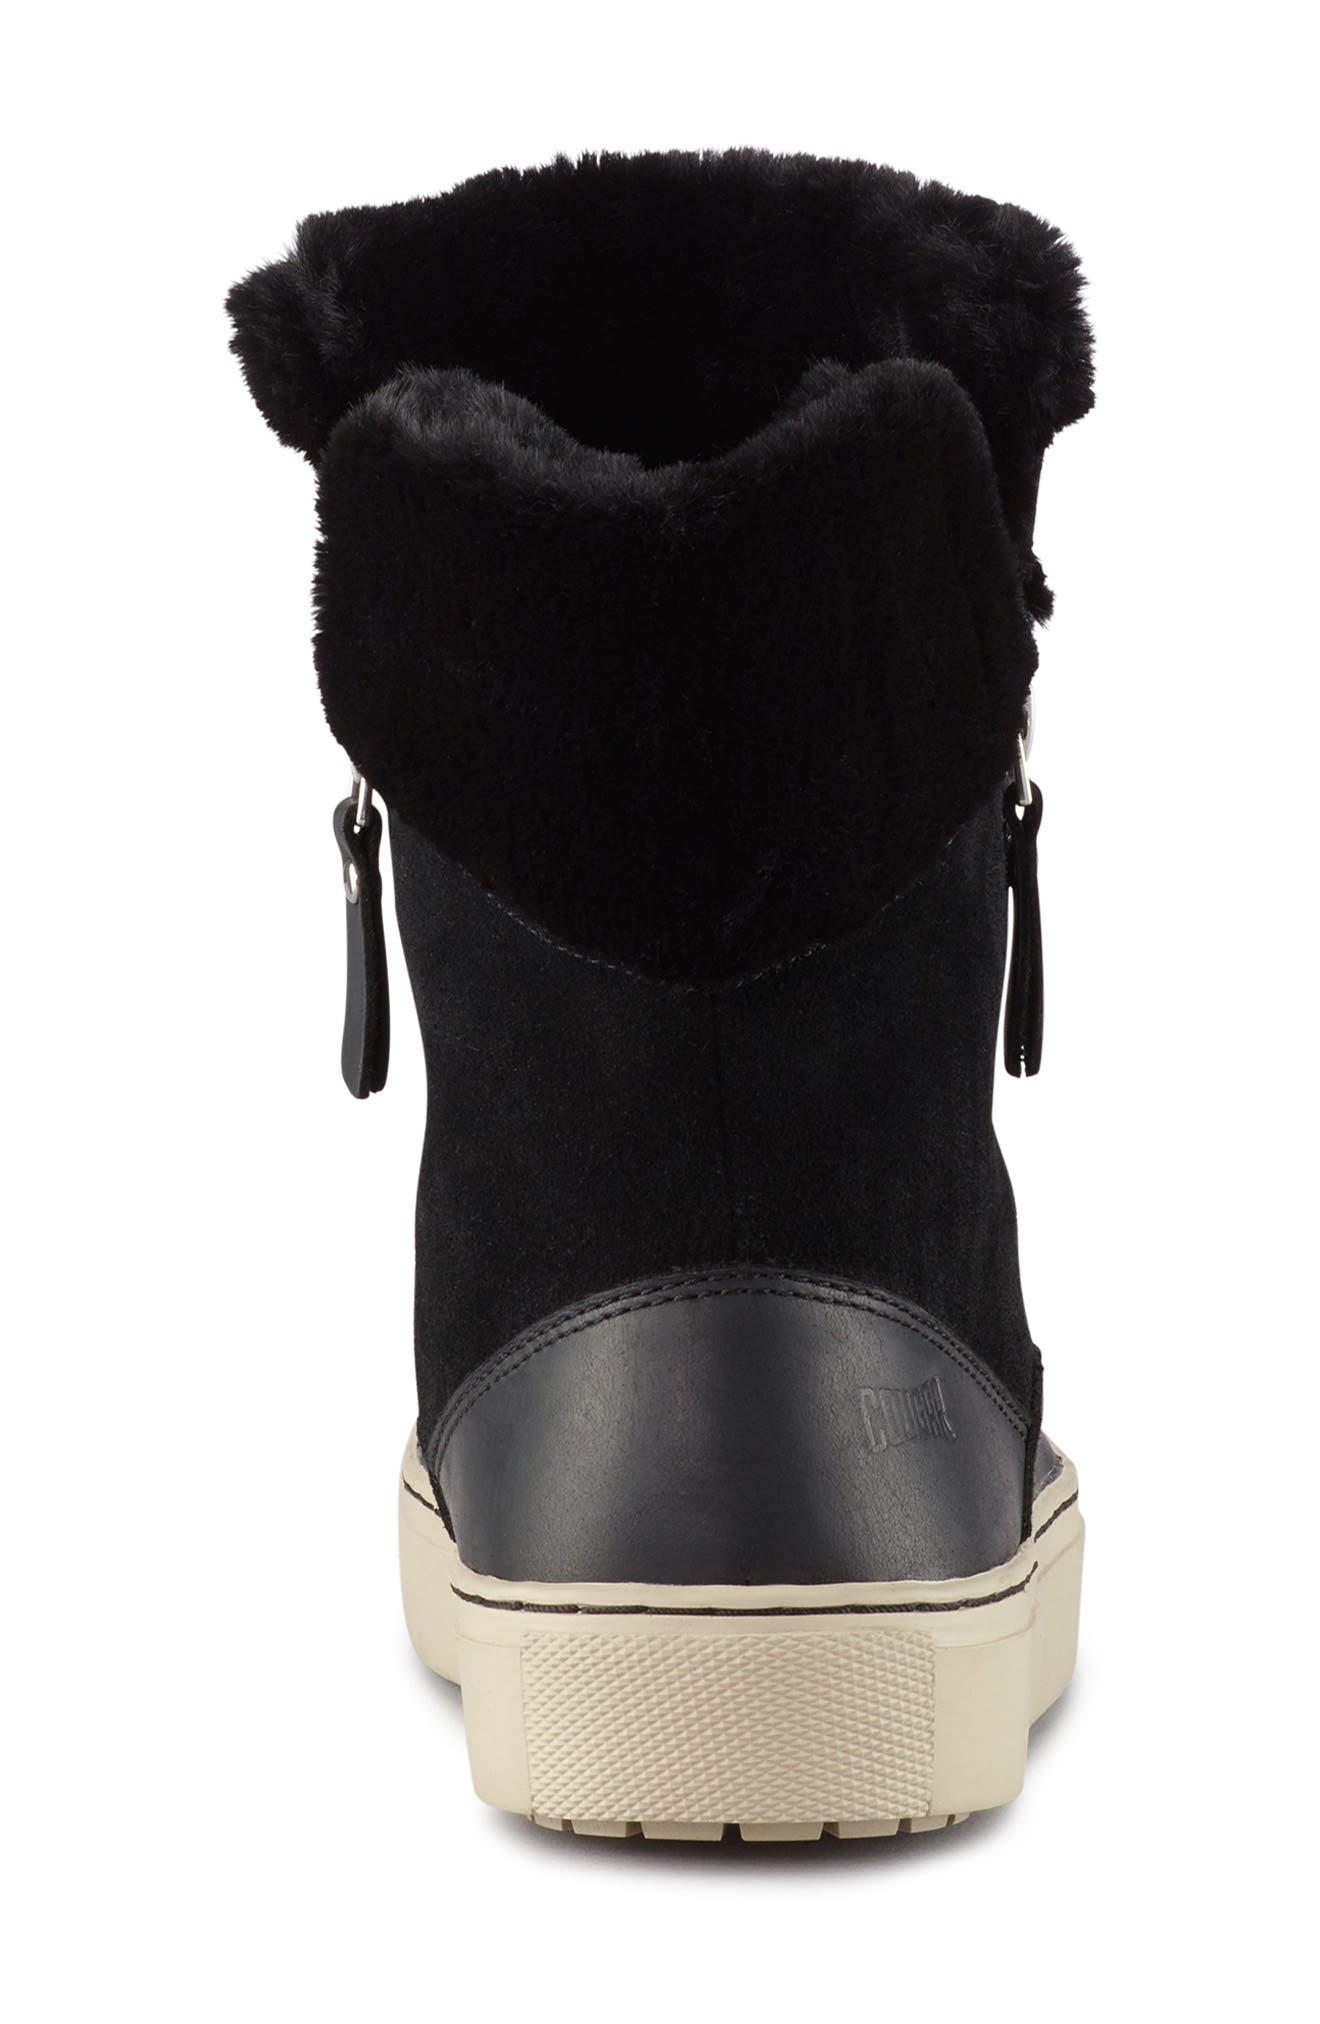 Dresden Waterproof Sneaker Boot with Faux Fur Trim,                             Alternate thumbnail 4, color,                             001